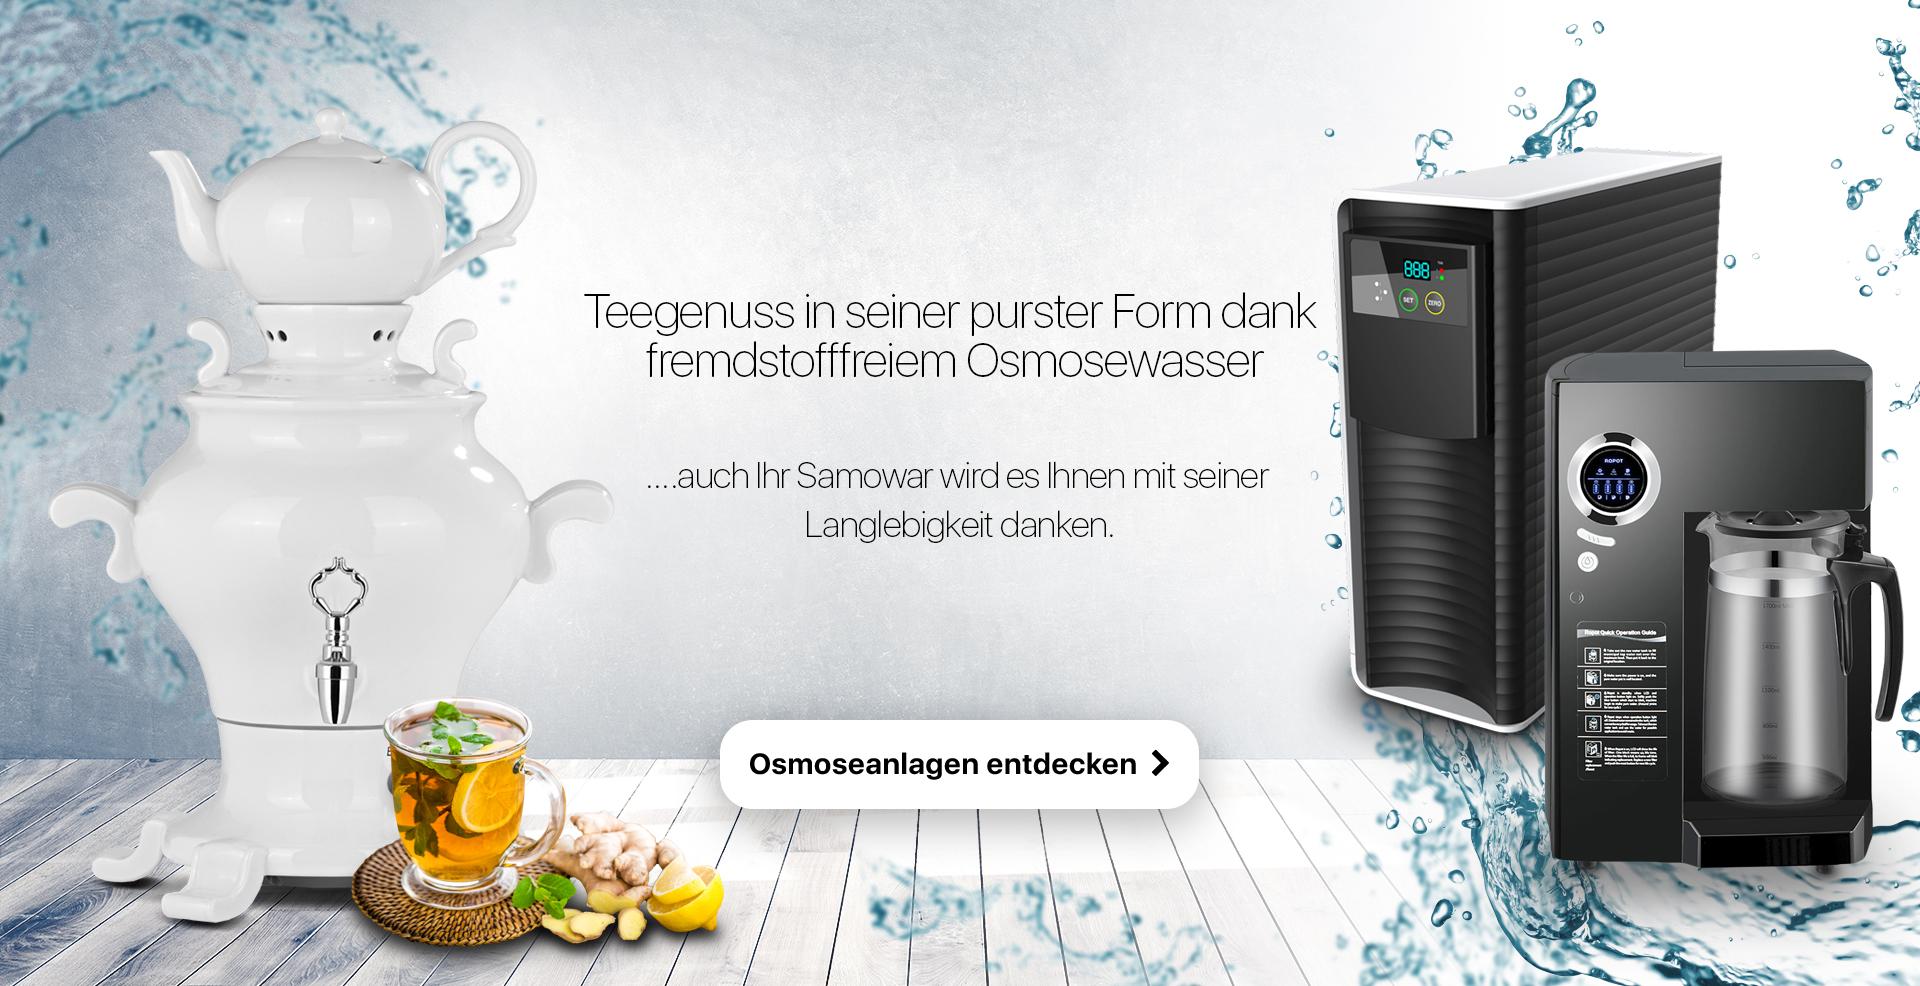 Osmosewasser_ohne-Samoware_06134